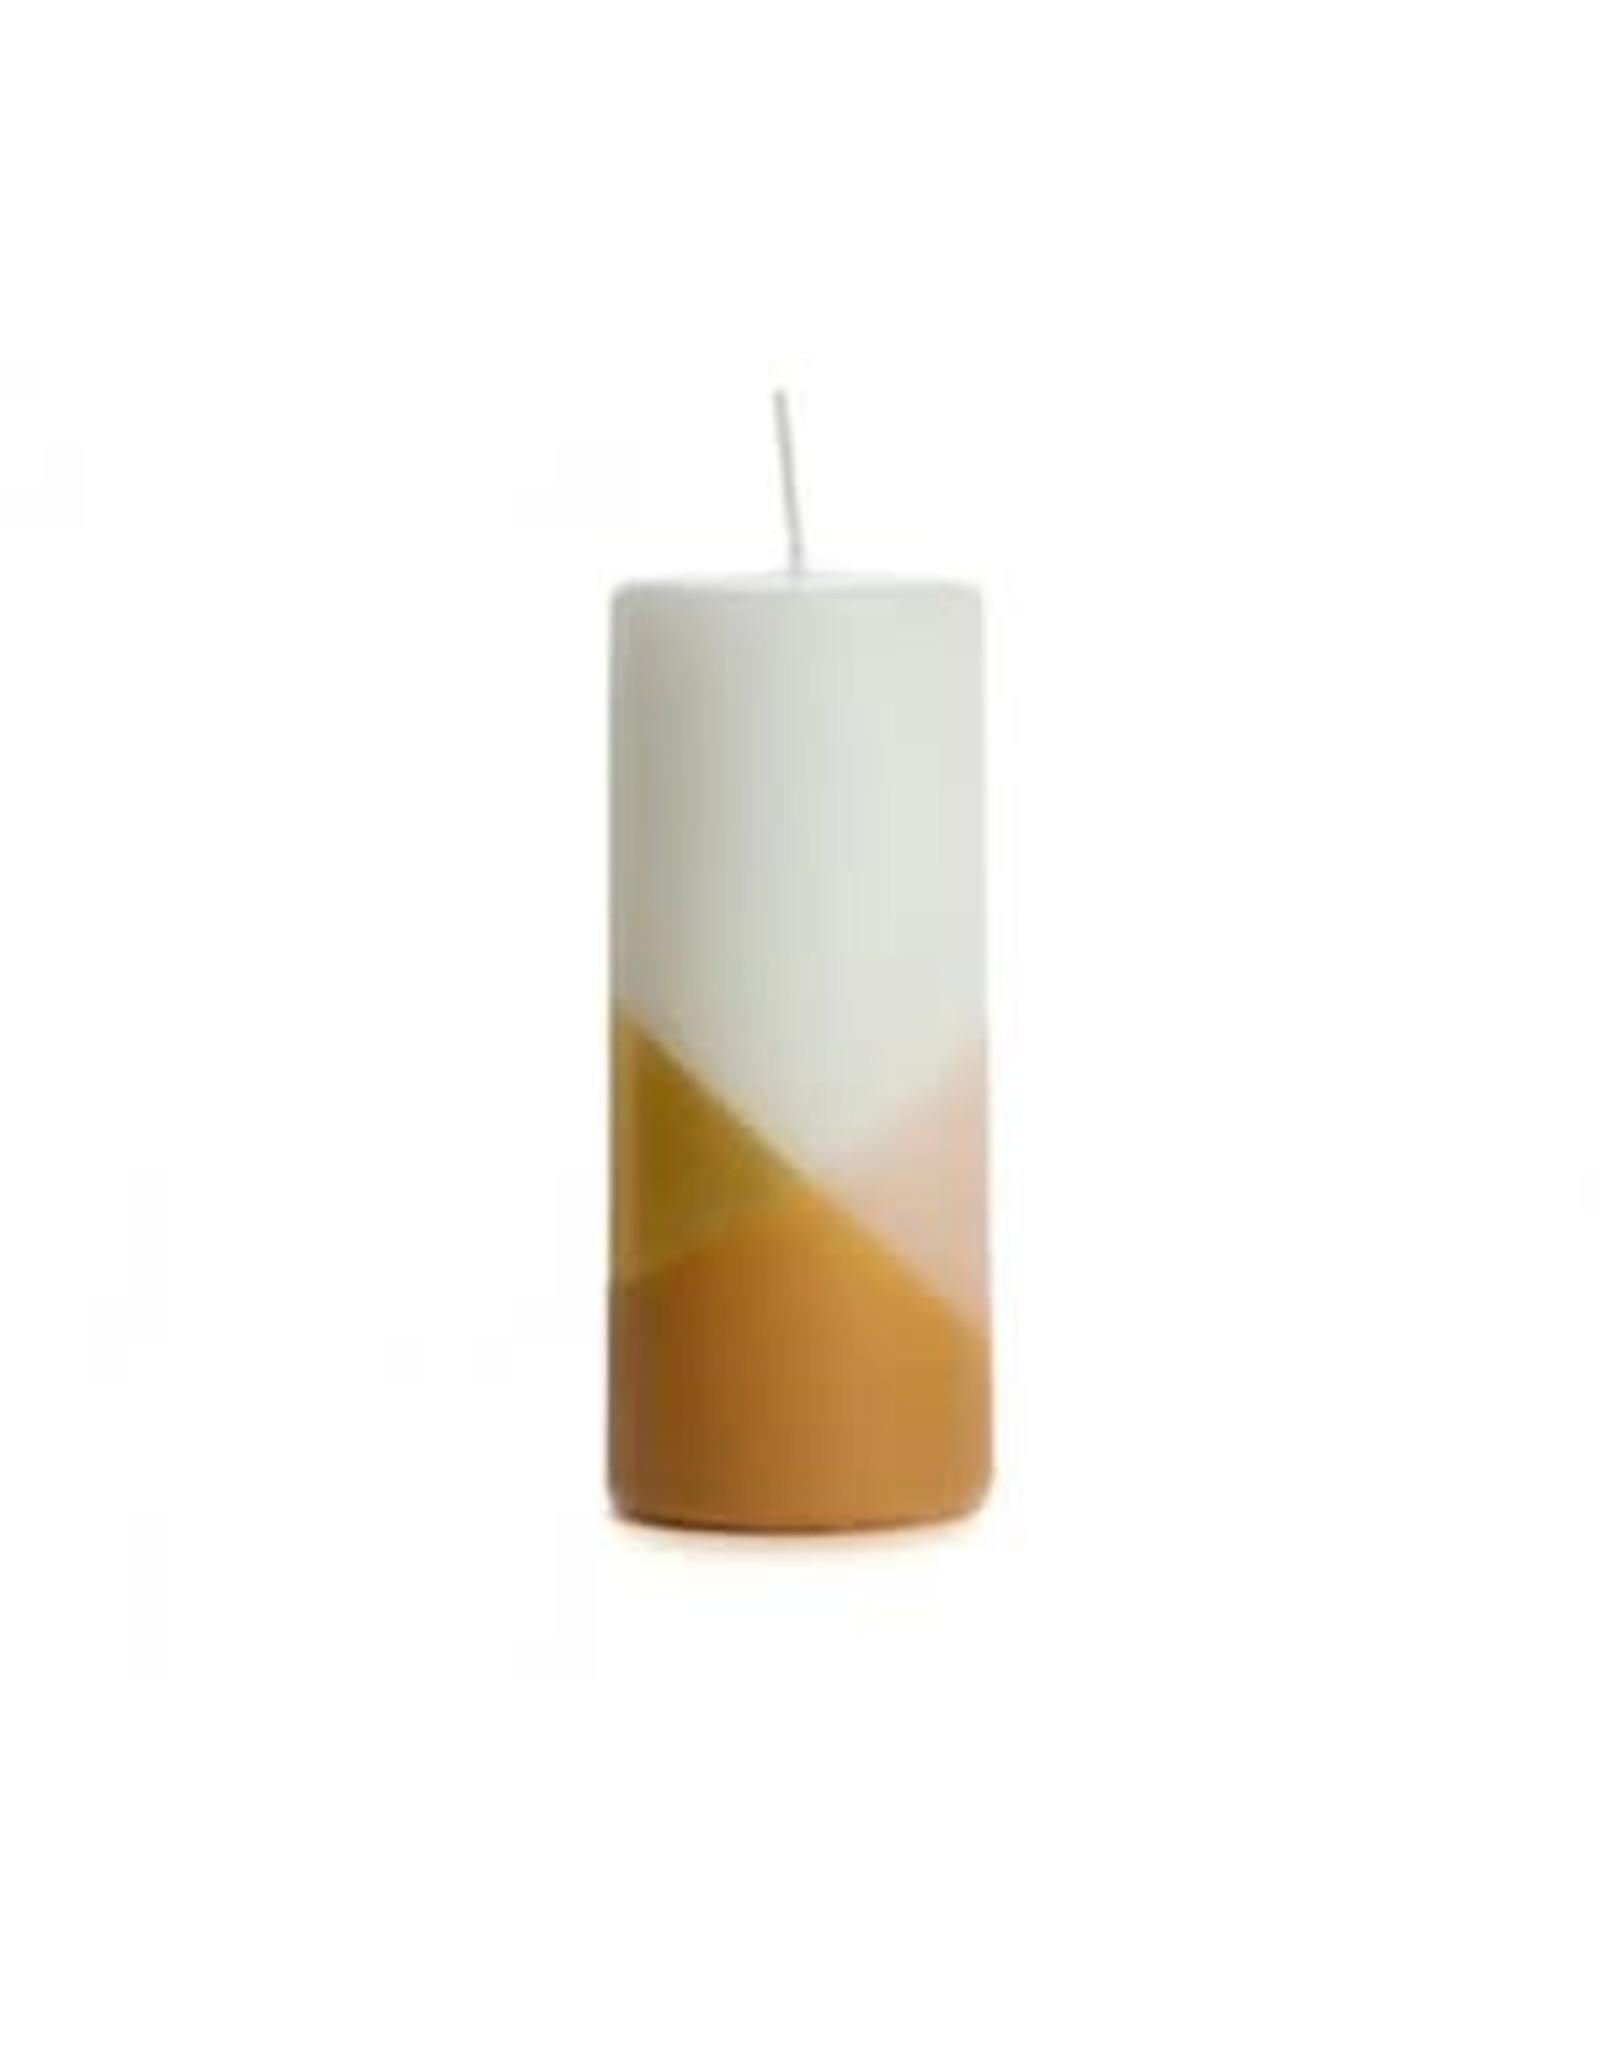 Rustik Lys Blokkaars Cross  - Blossom  - Ø 6 x 15 cm - Brandtijd +/- 54u